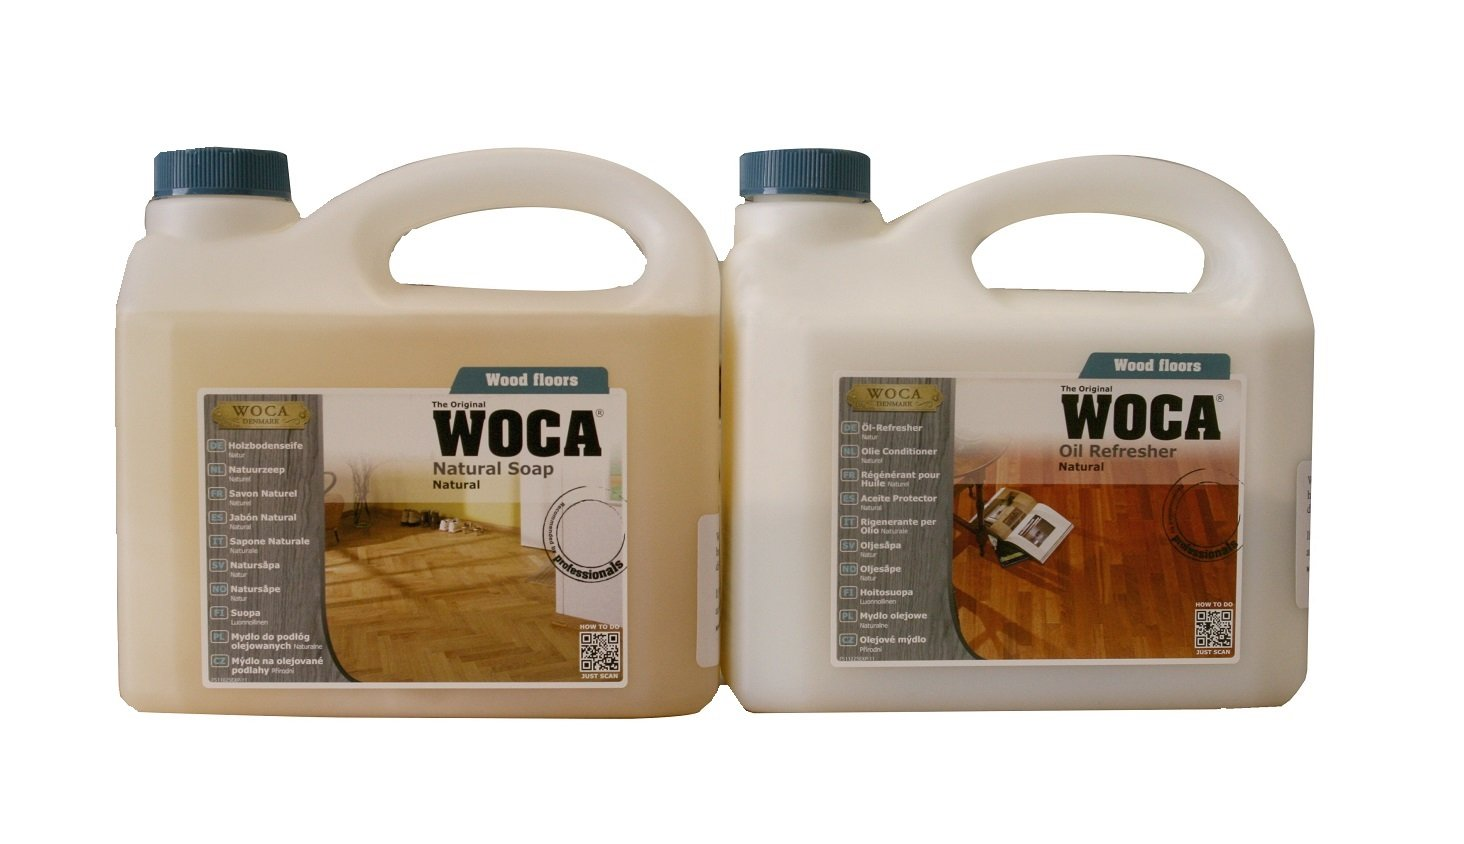 Woca Maintenance Sets 2.5 Liters (Natural 2.5 liters Sets)